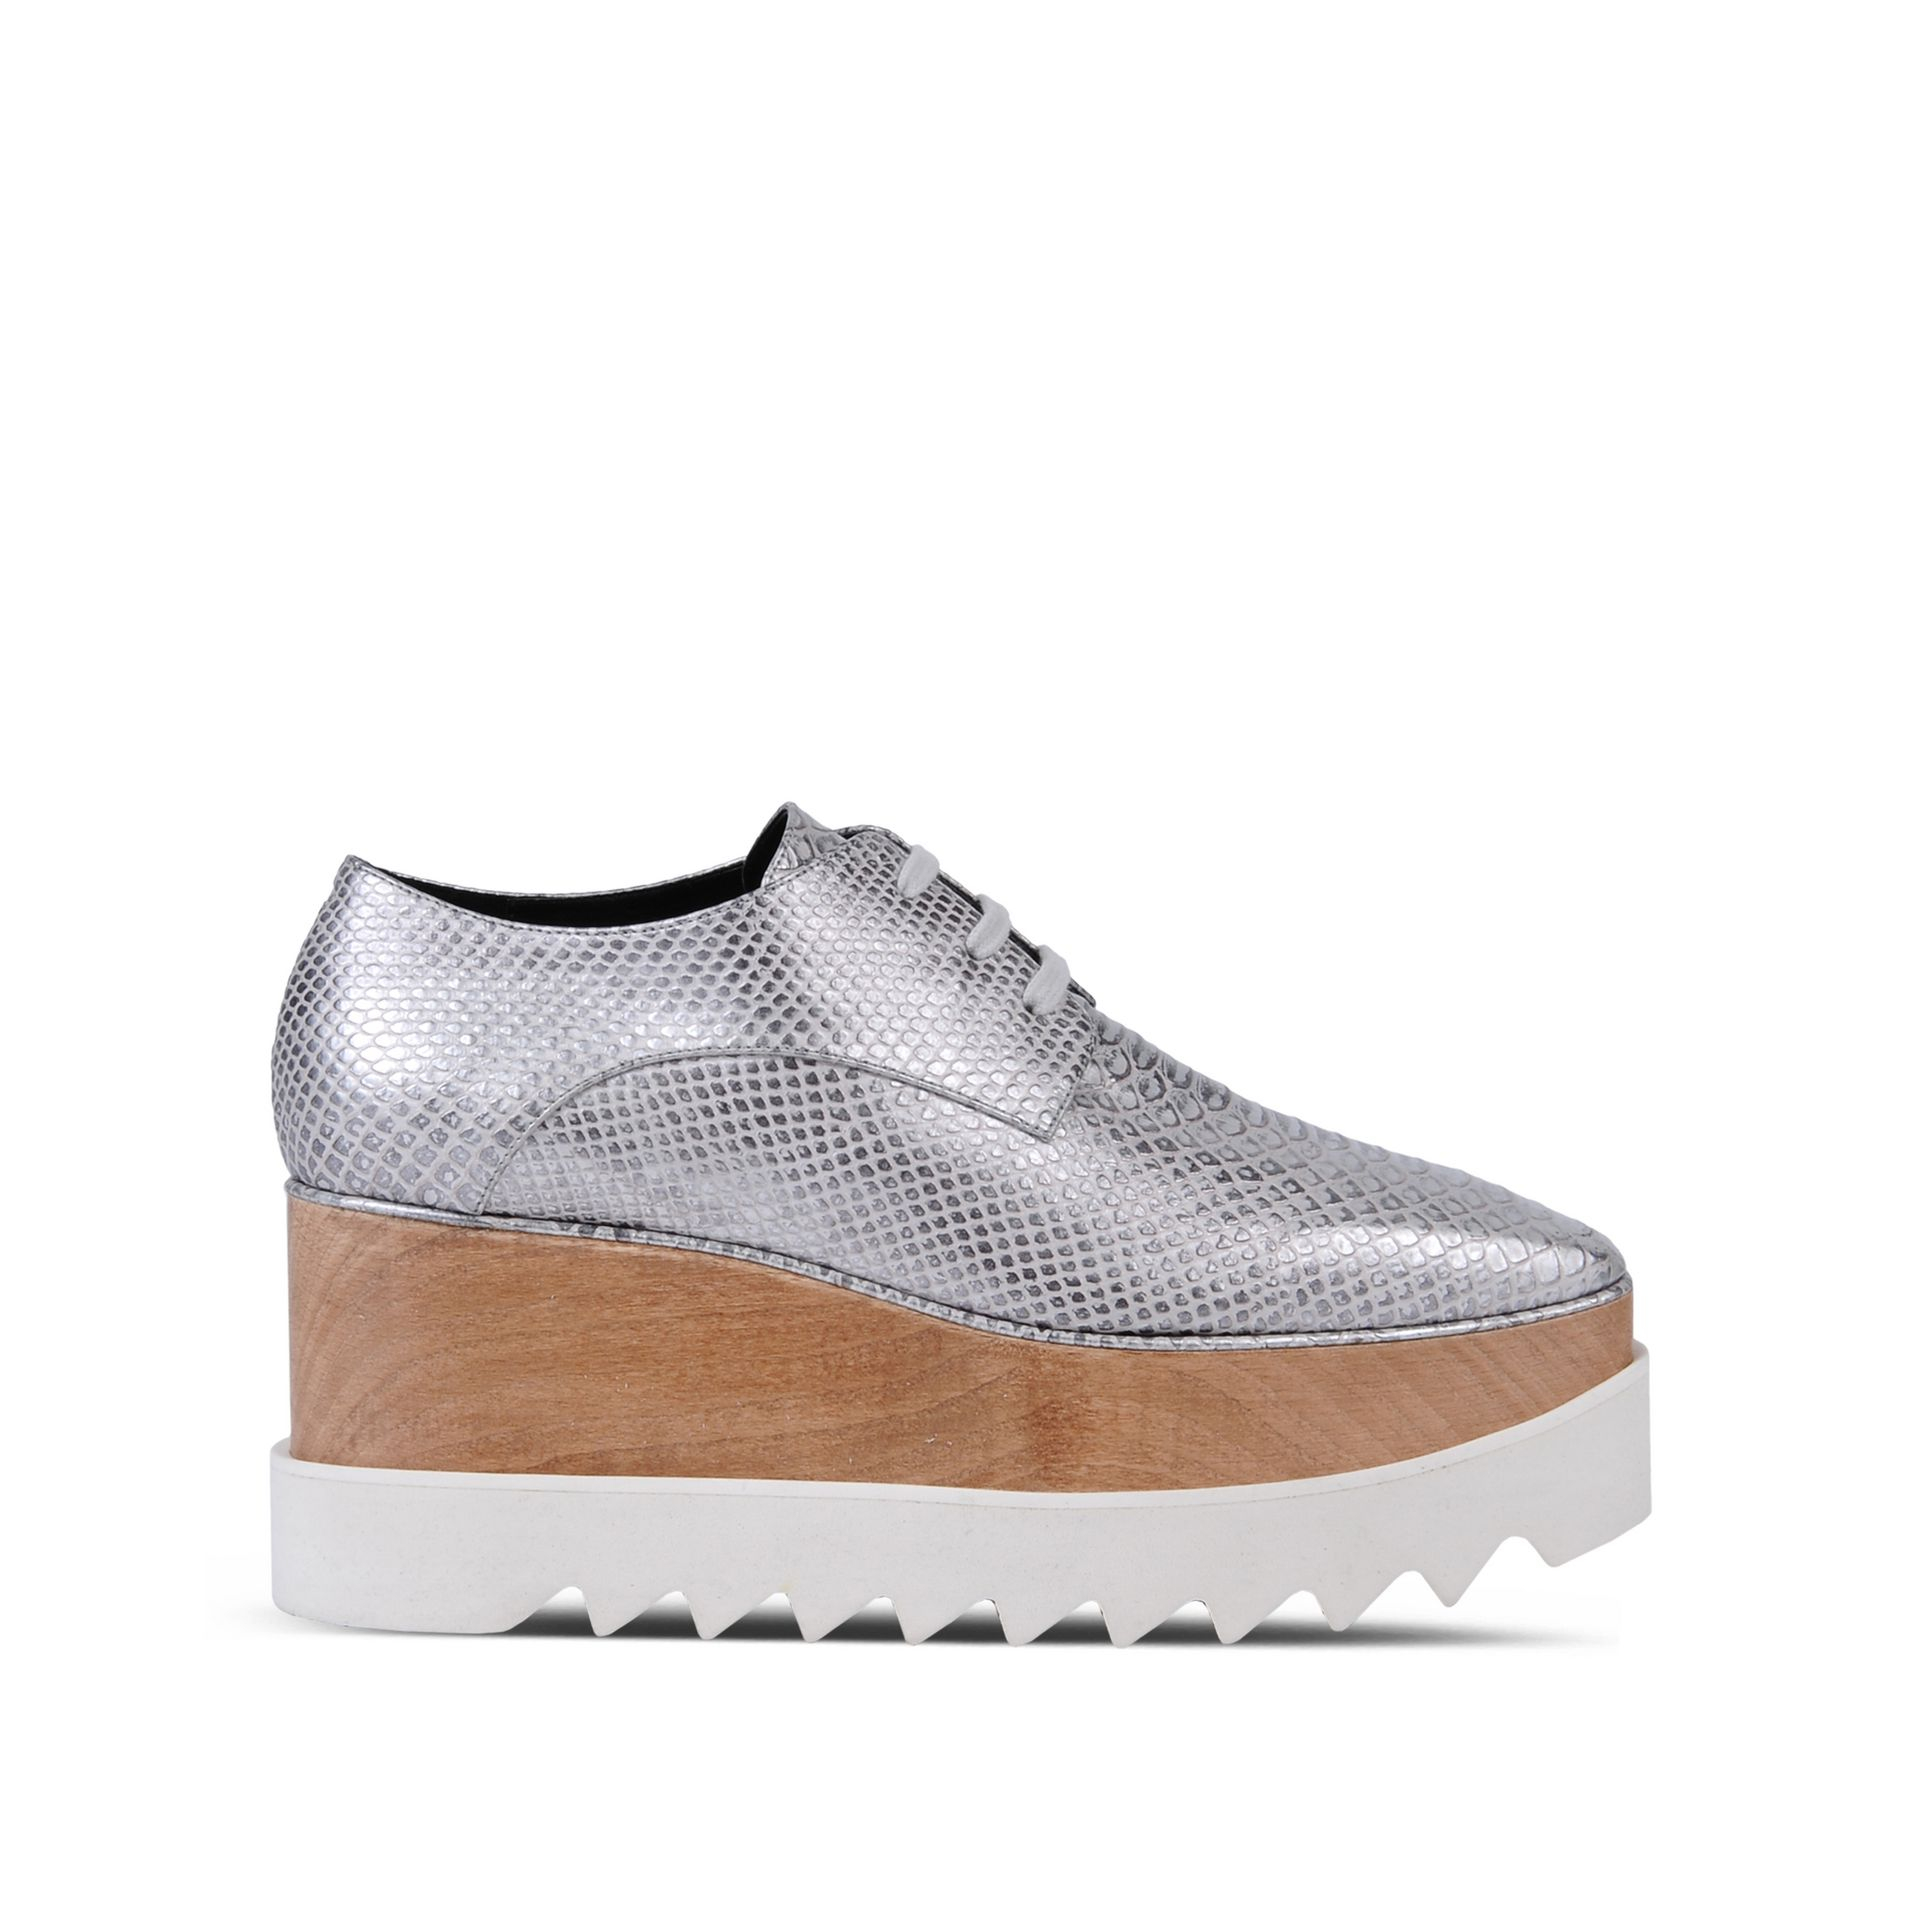 6f6d4b996c7 Lyst - Stella McCartney Chrome Elyse Shoes in Metallic